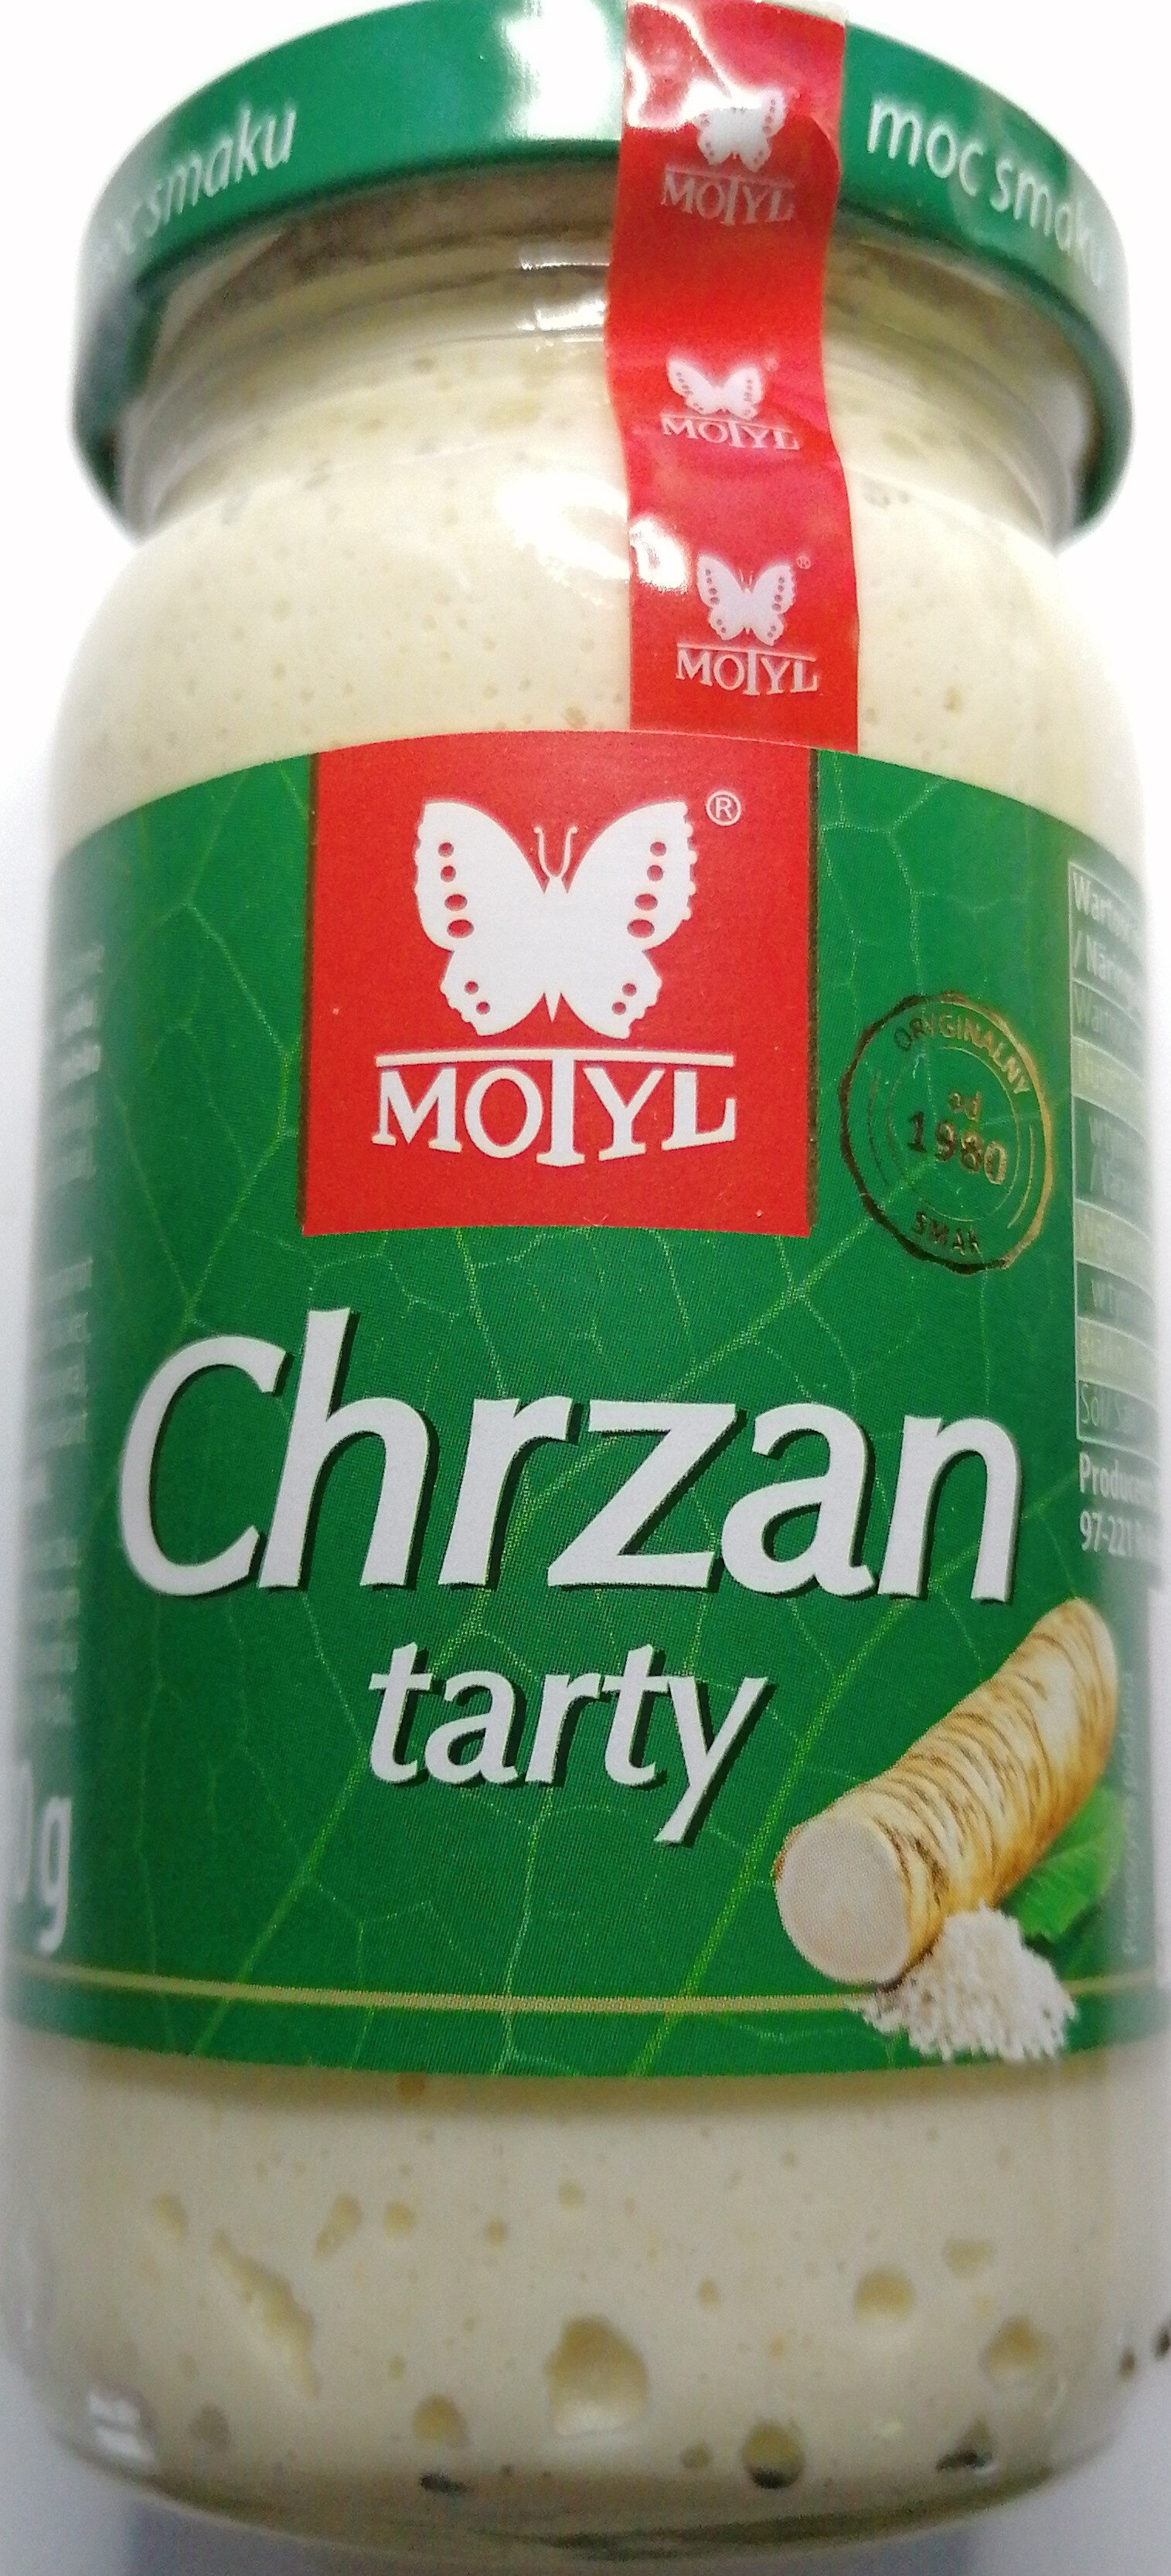 Chrzan tarty - Product